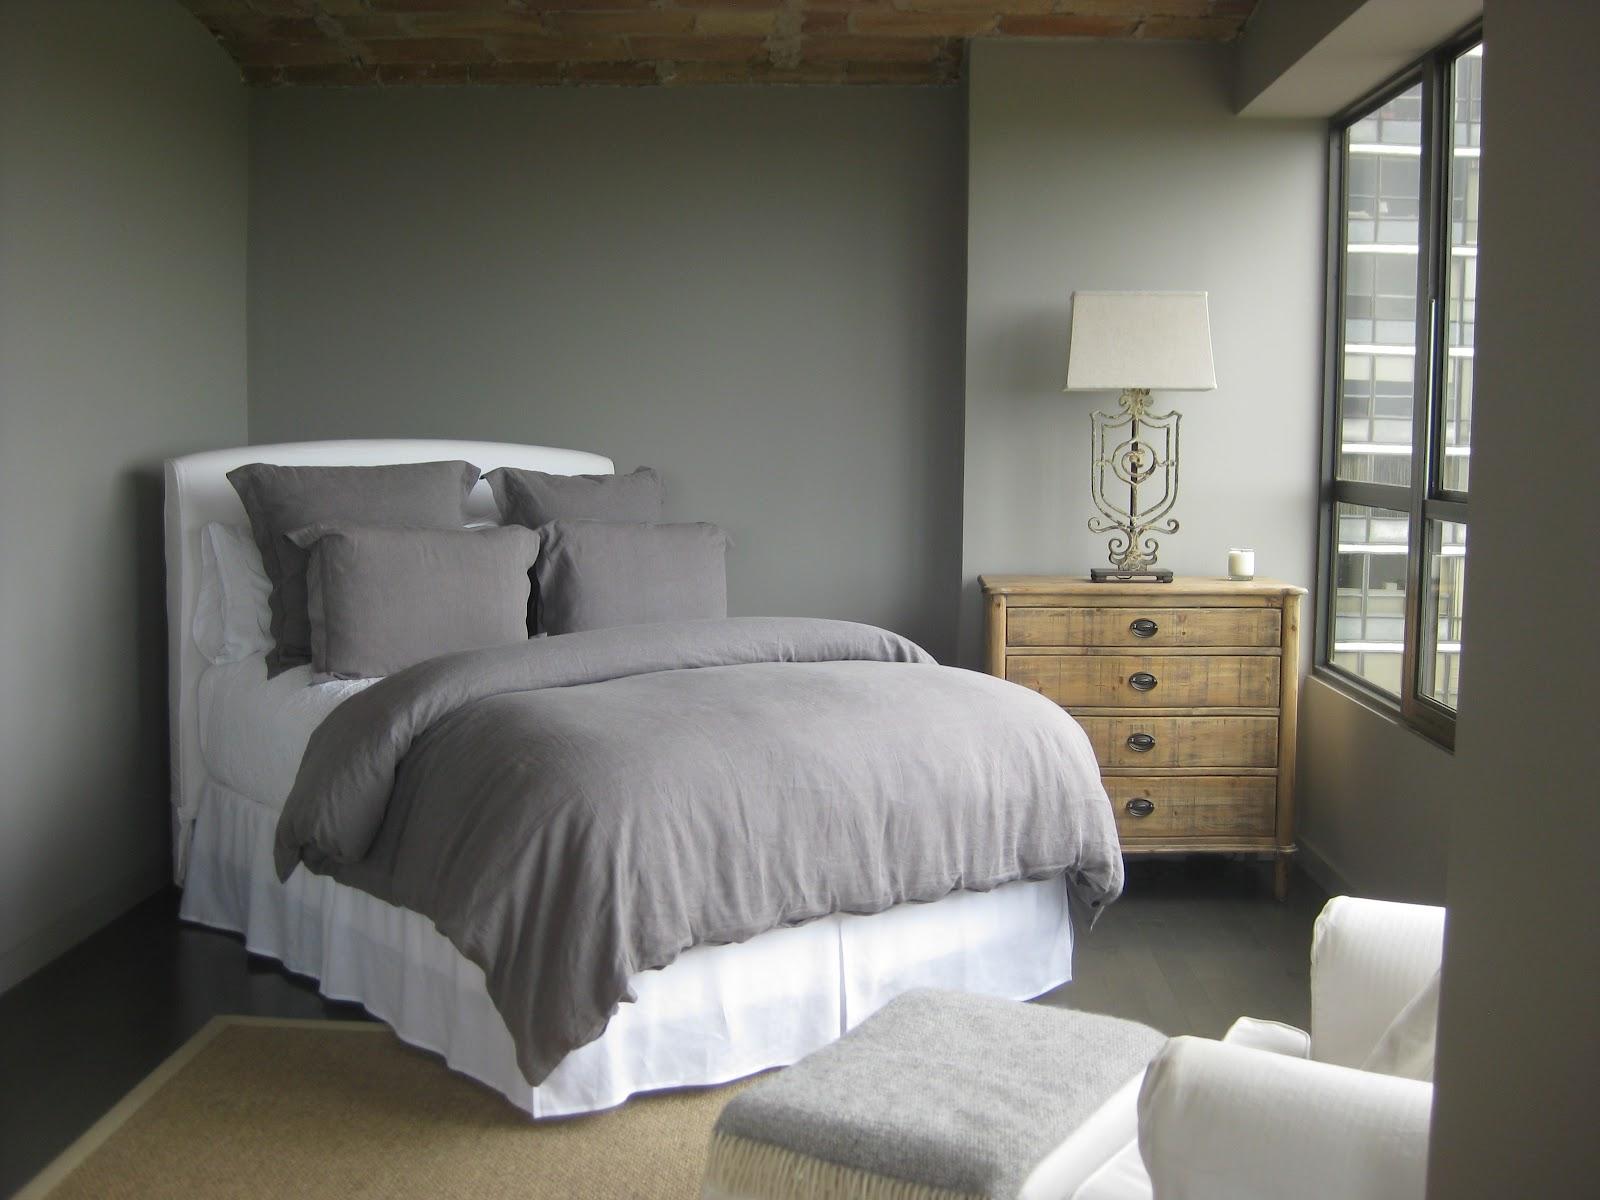 Bedroom Wallpaper Accent Wall